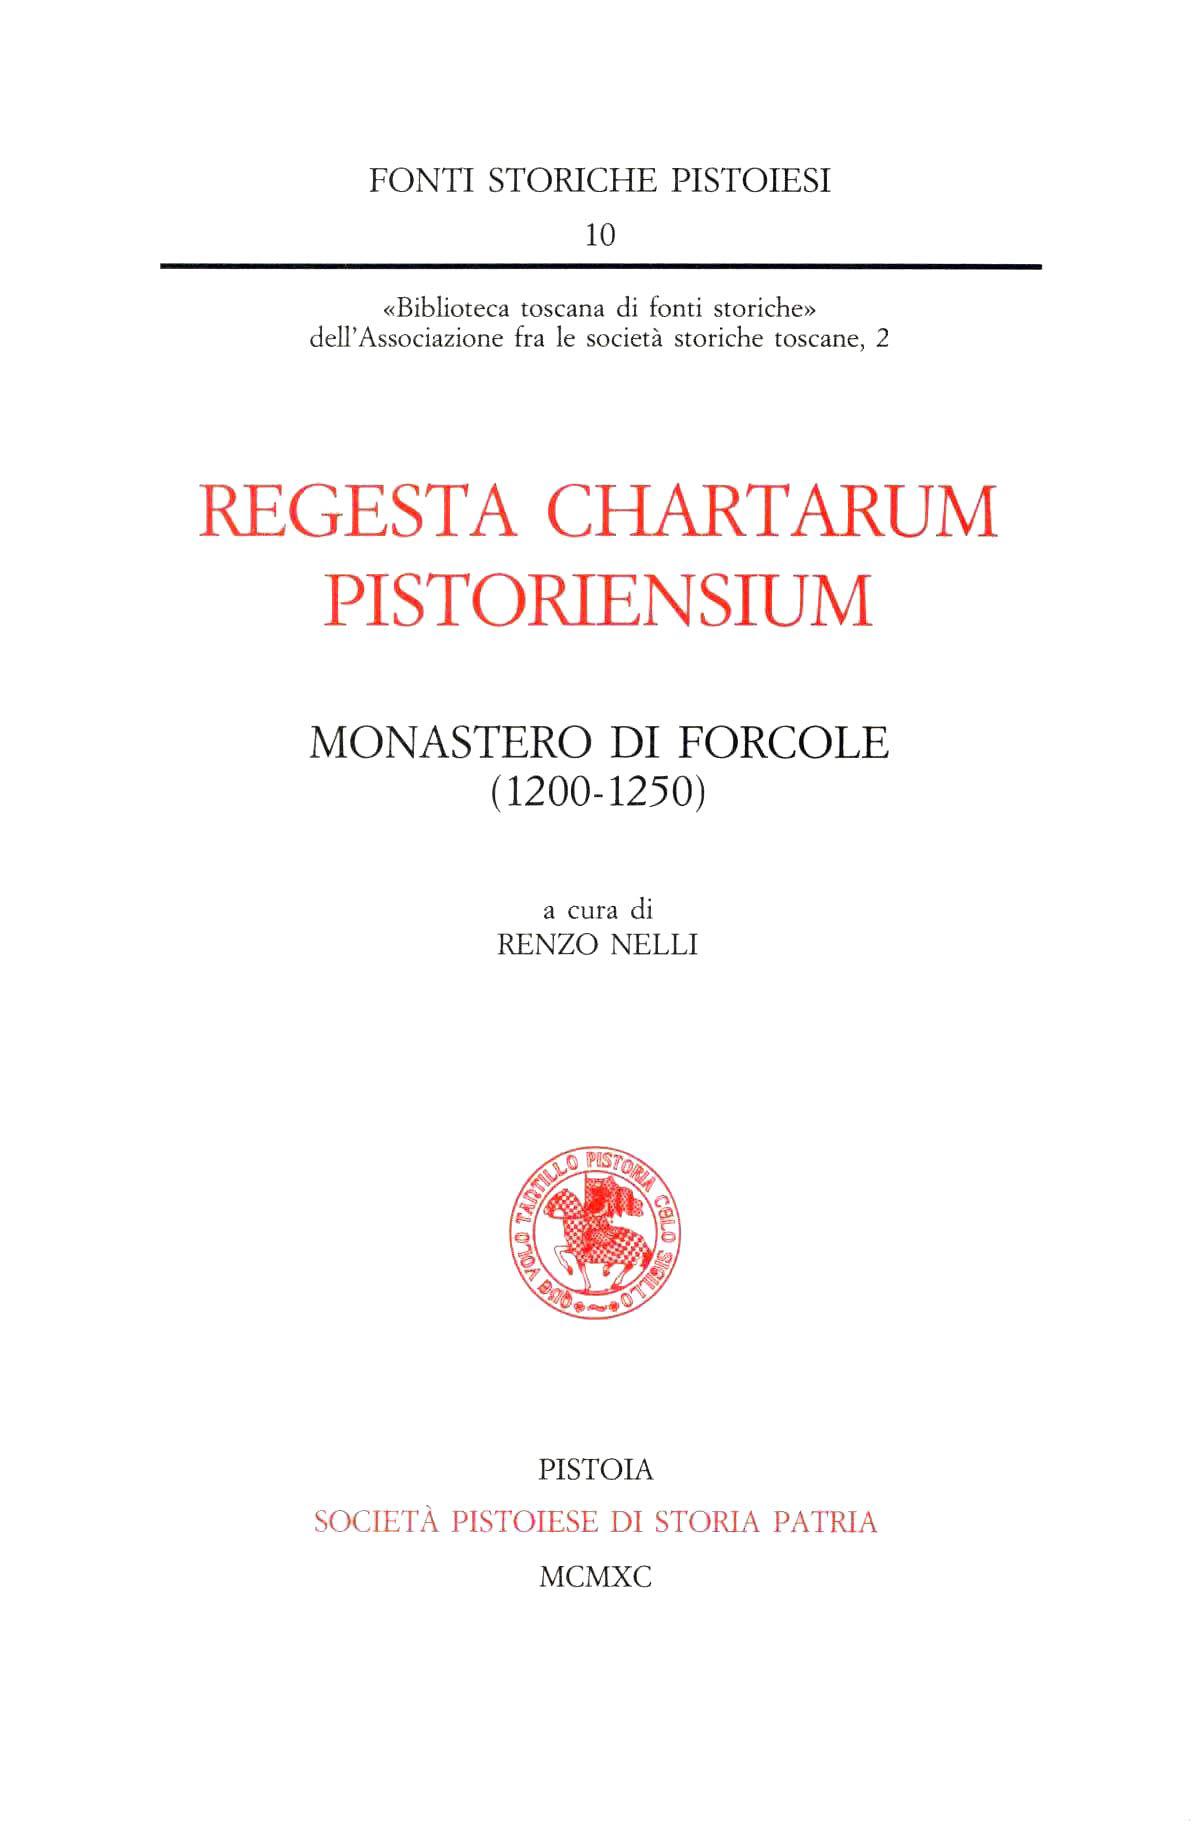 !Monastero Forcole 00001.jpg